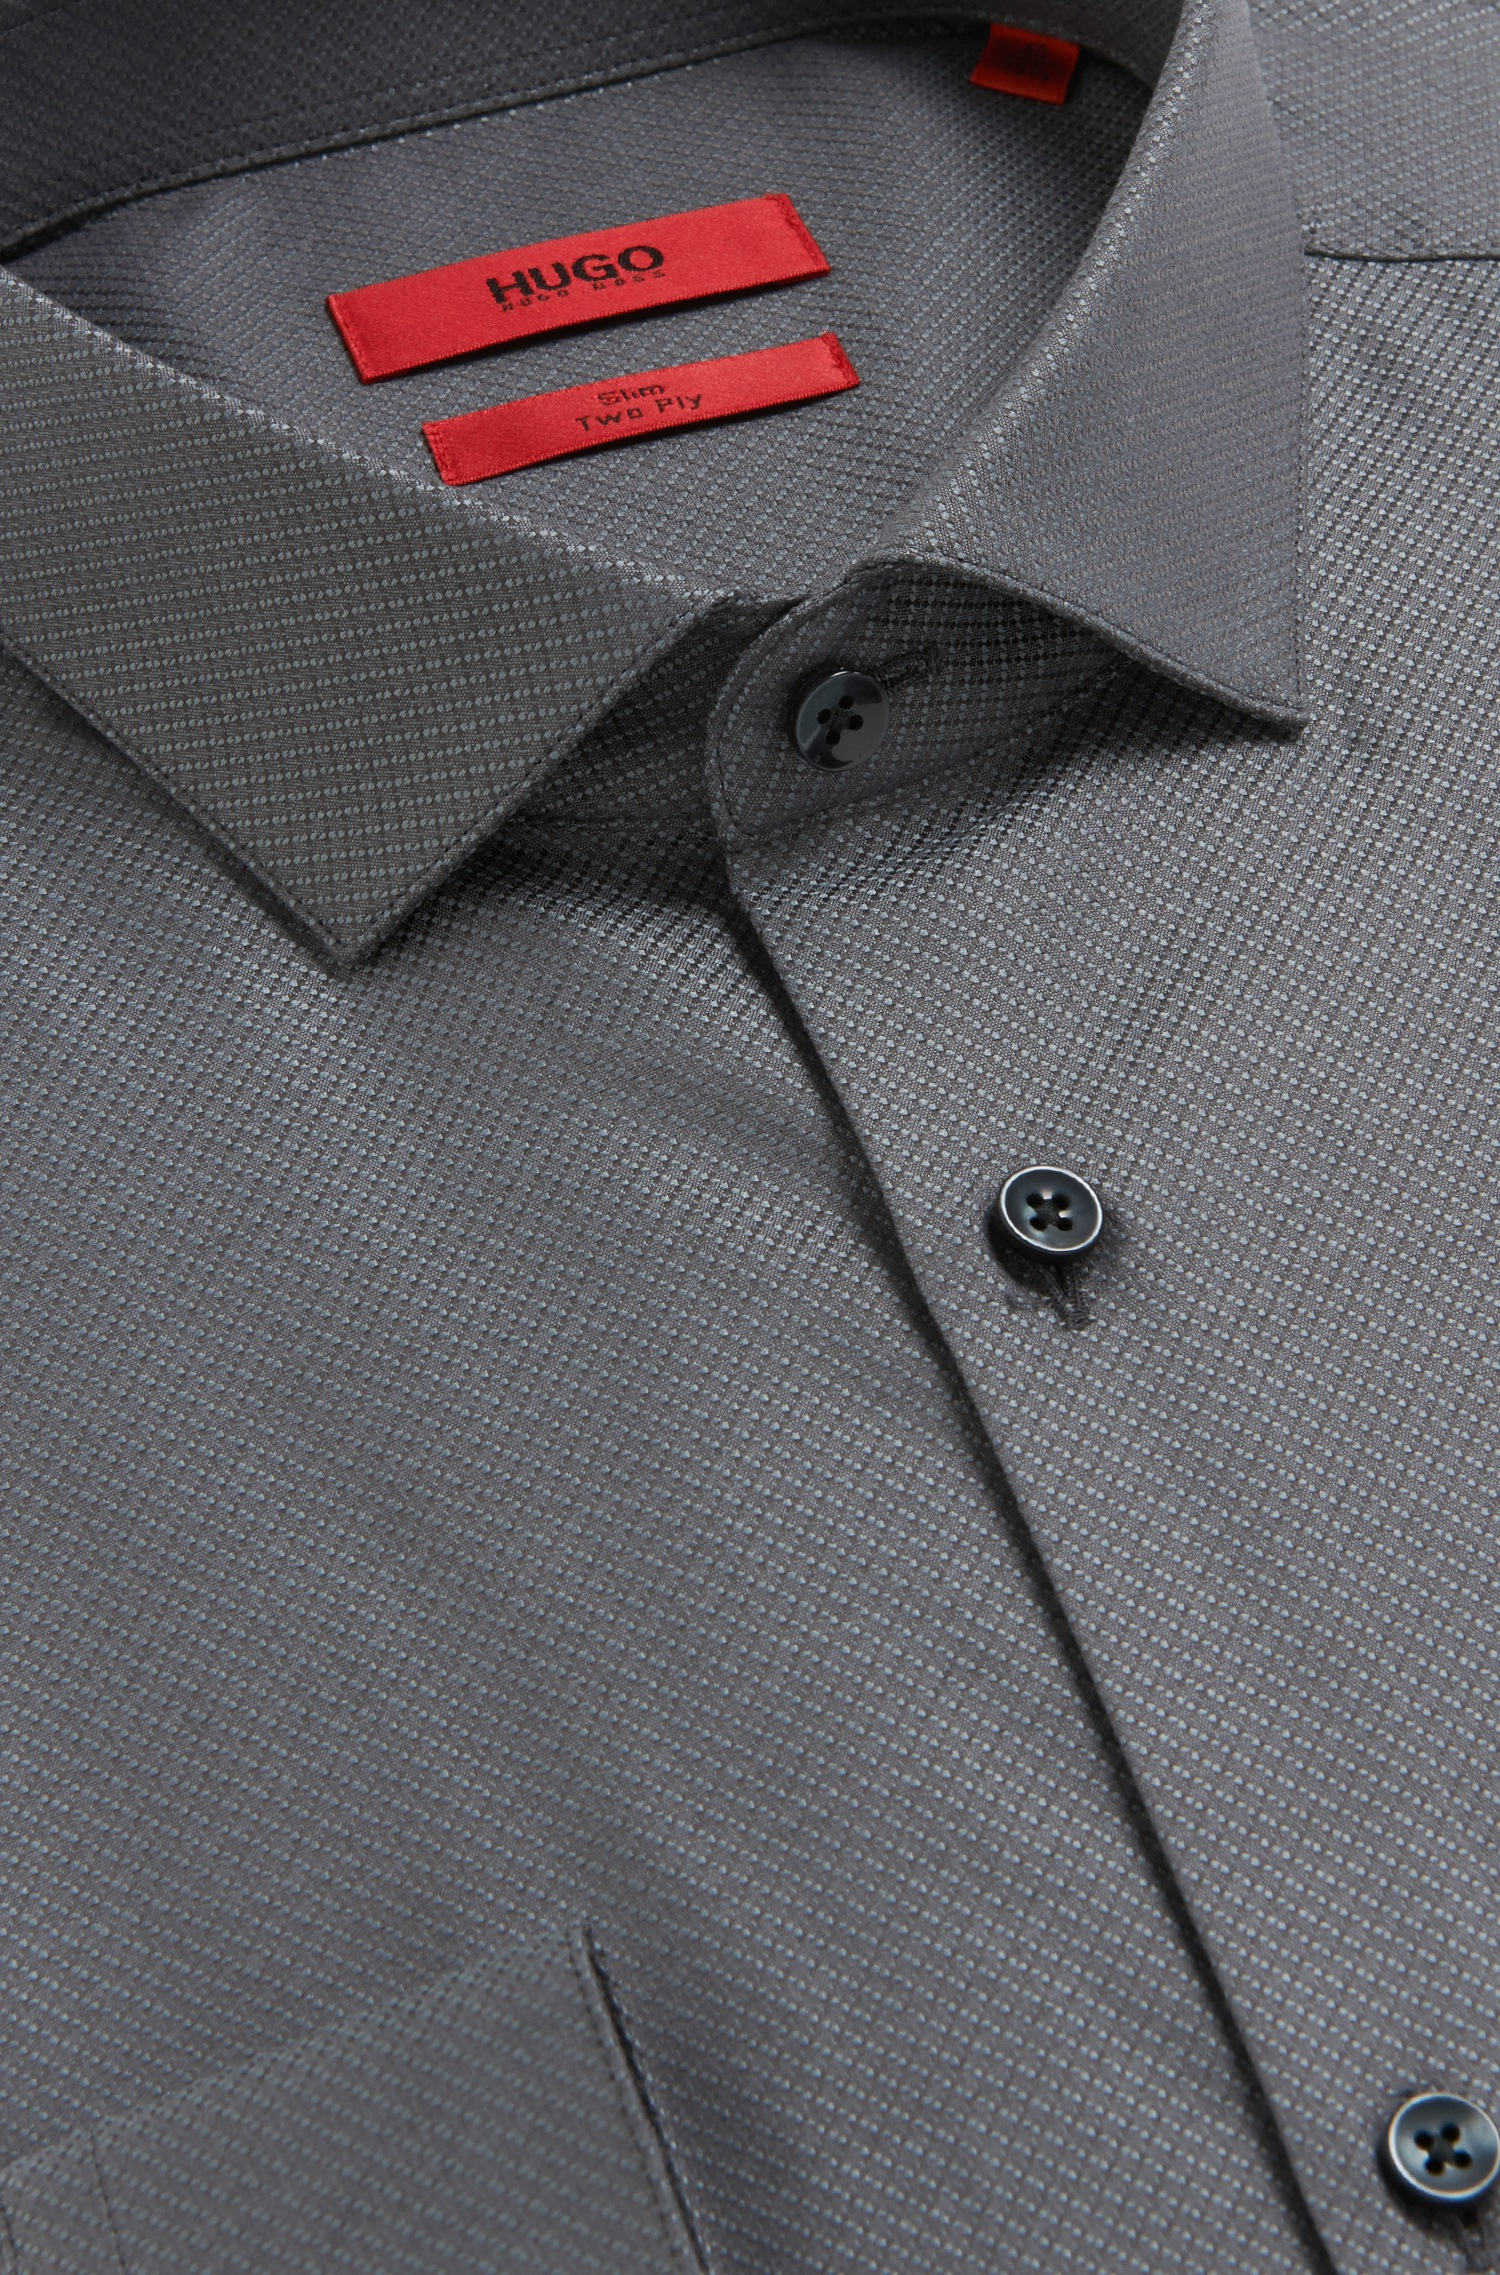 Hugo 39 erondo 39 slim fit 2 ply cotton dress shirt in gray for 2 ply cotton dress shirt